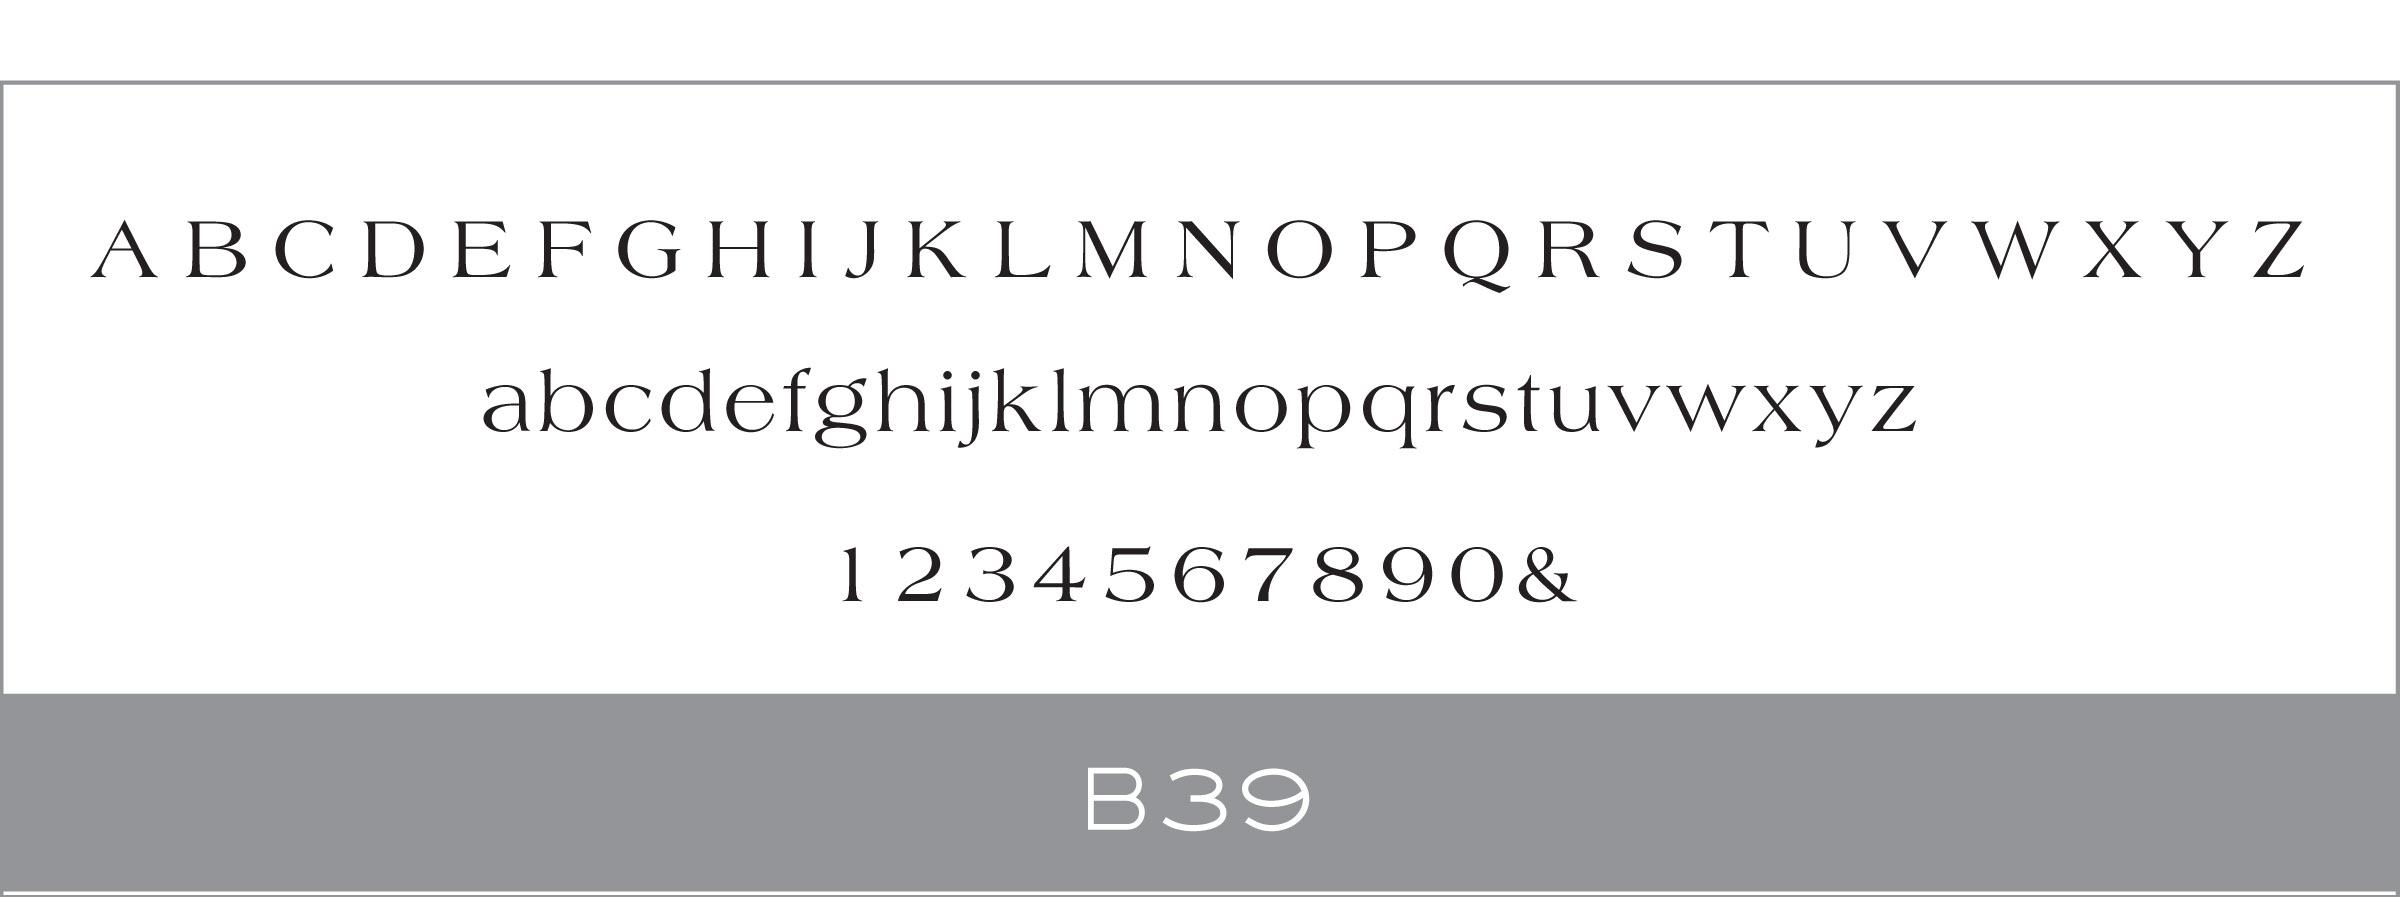 B39_Haute_Papier_Font.jpg